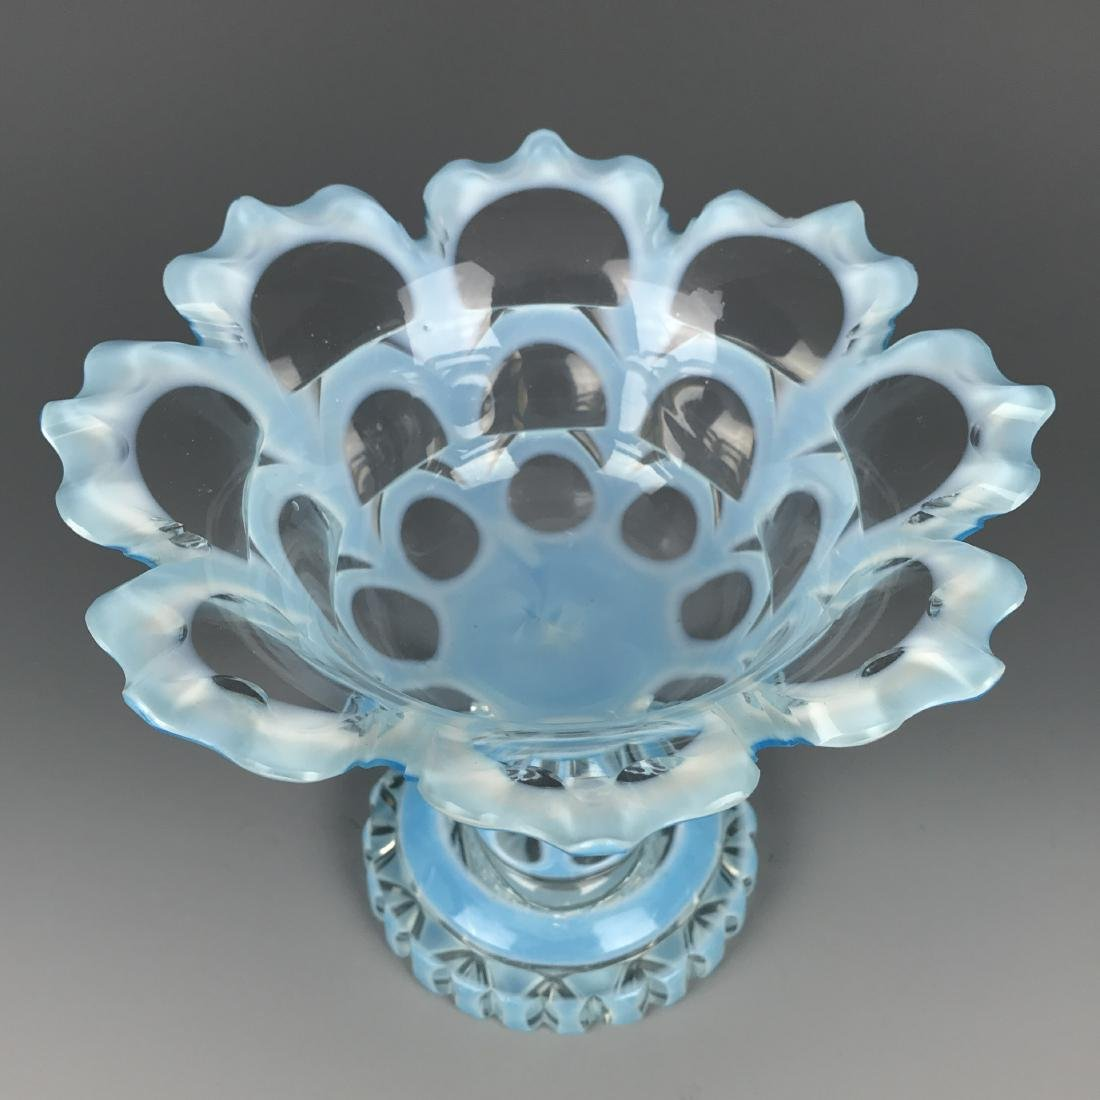 19th C. Bohemian Diamond Cut Compote - 3